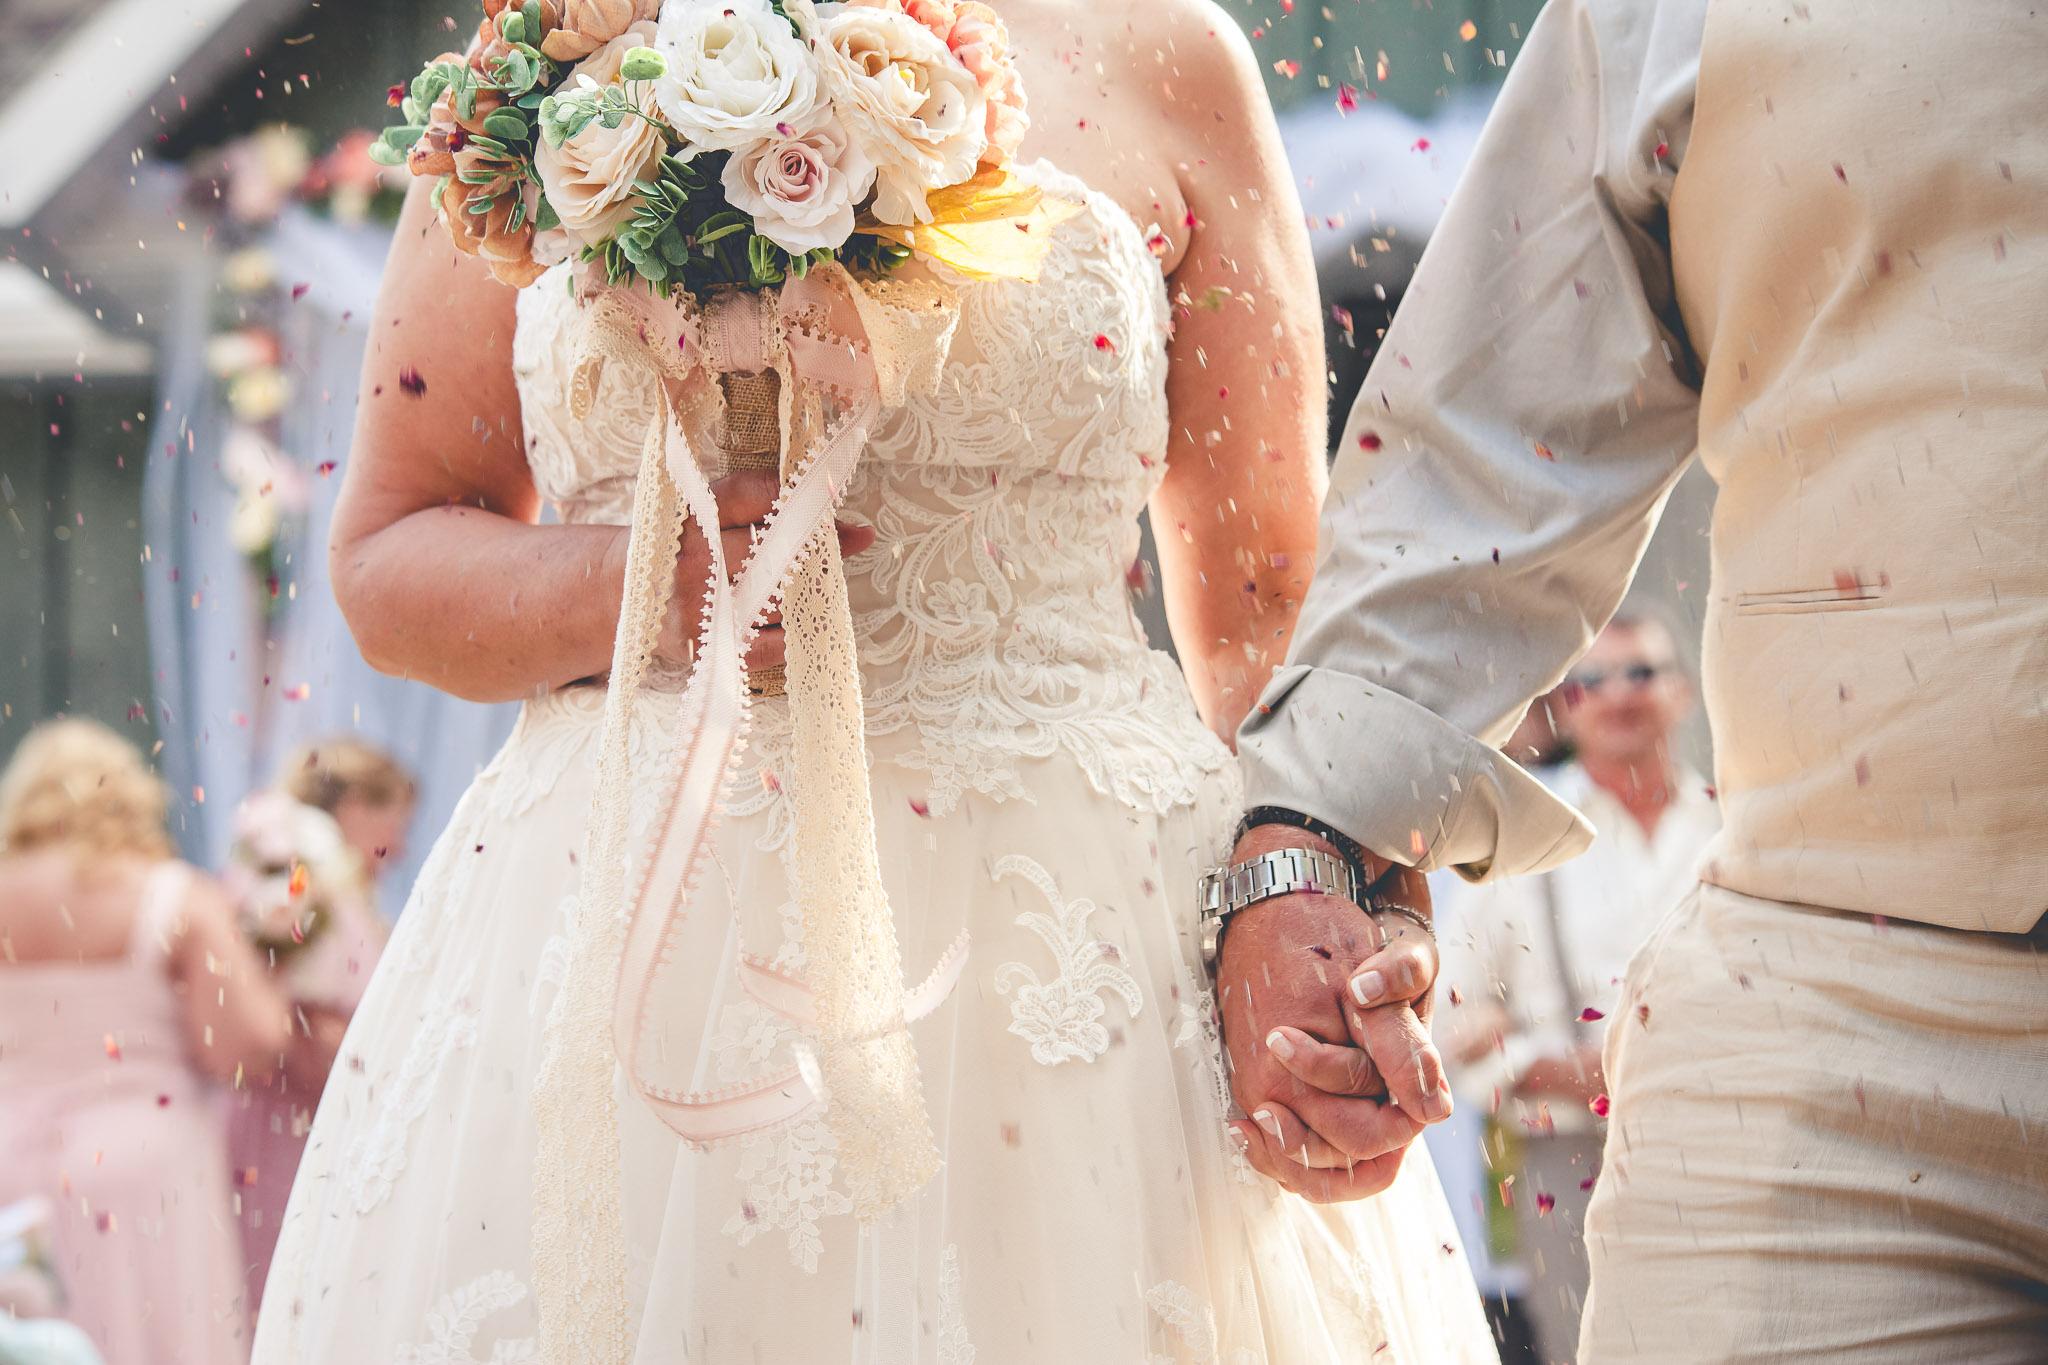 Barrie & Muskoka Wedding Photography Amy D Photography_-1037-2.jpg